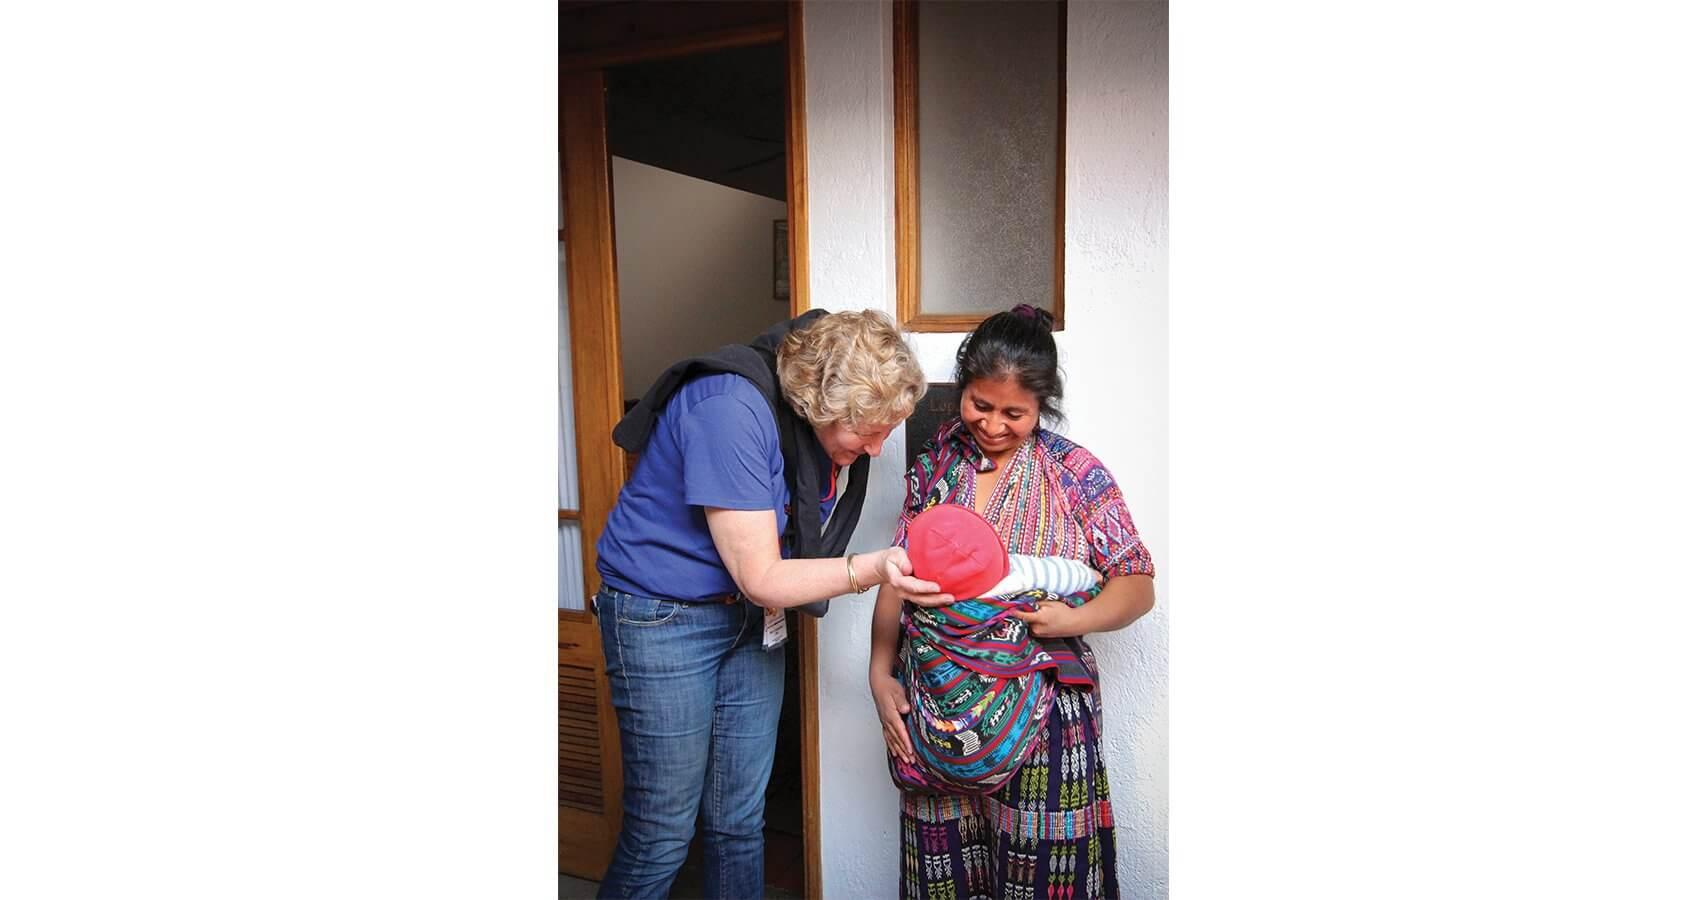 Pam Gallacher greets patients at Casa de Fe, Faith in Practice's 100-bed patient facility. (Credit: Josie Johnson)